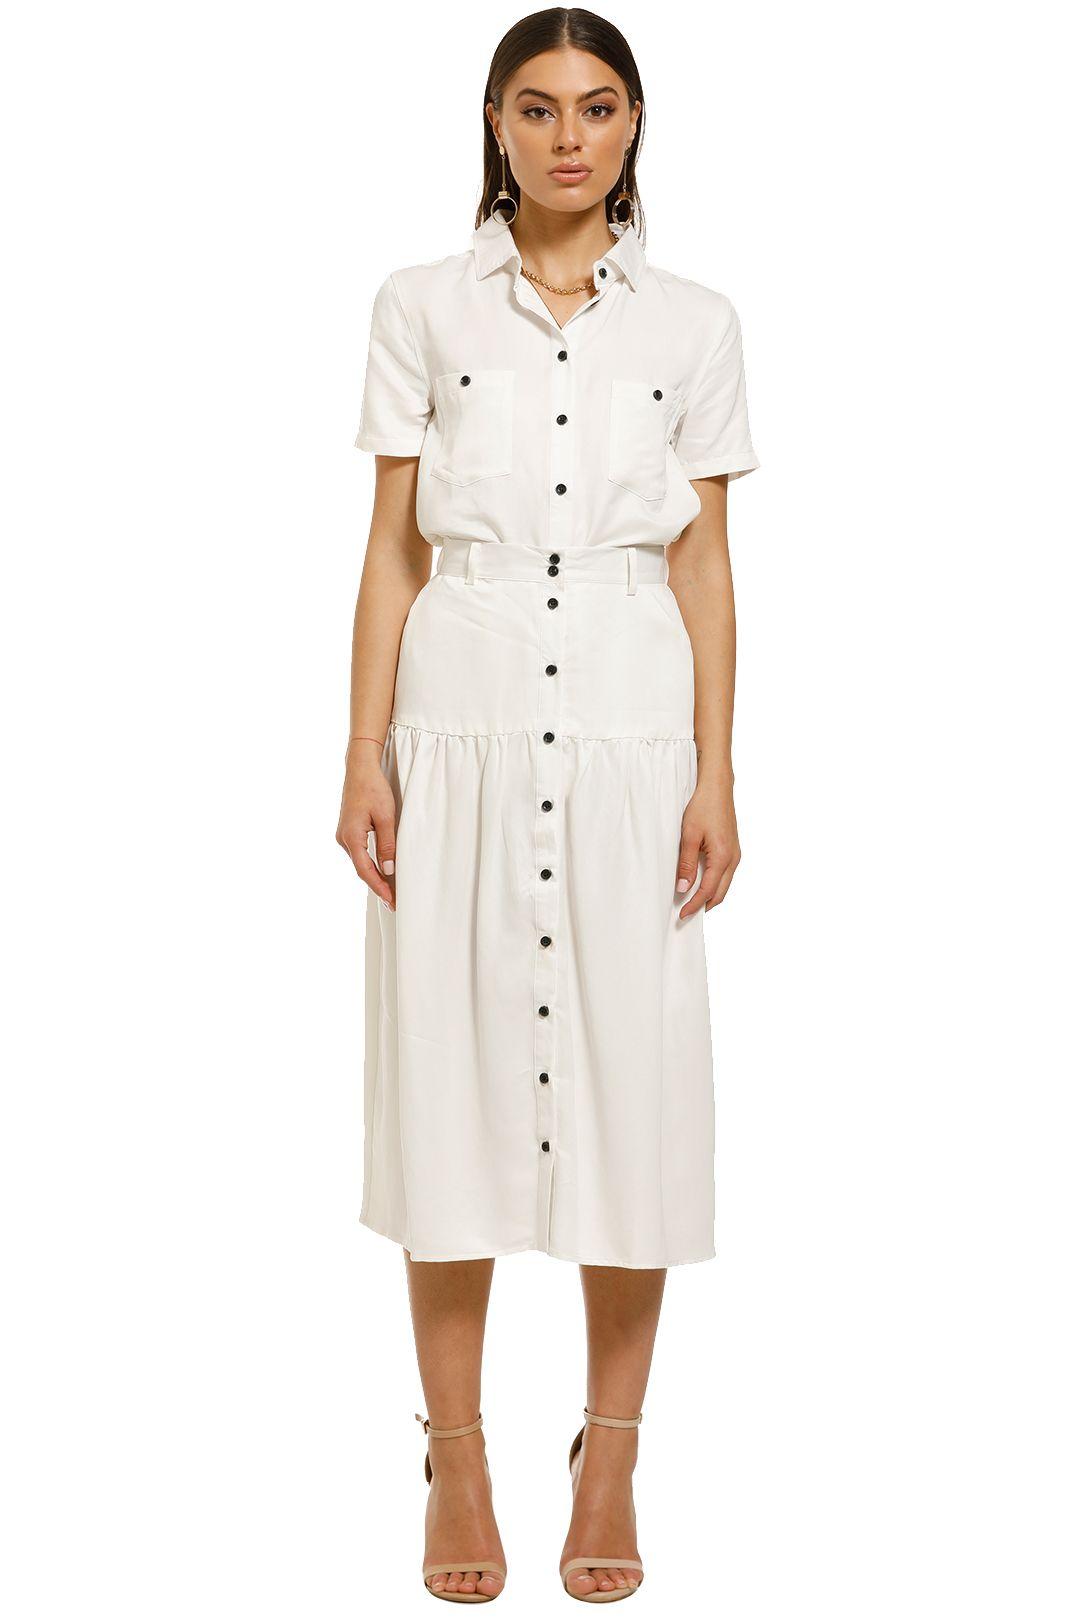 Third-Form-Vice-Versa-Midi-Skirt-White-Front